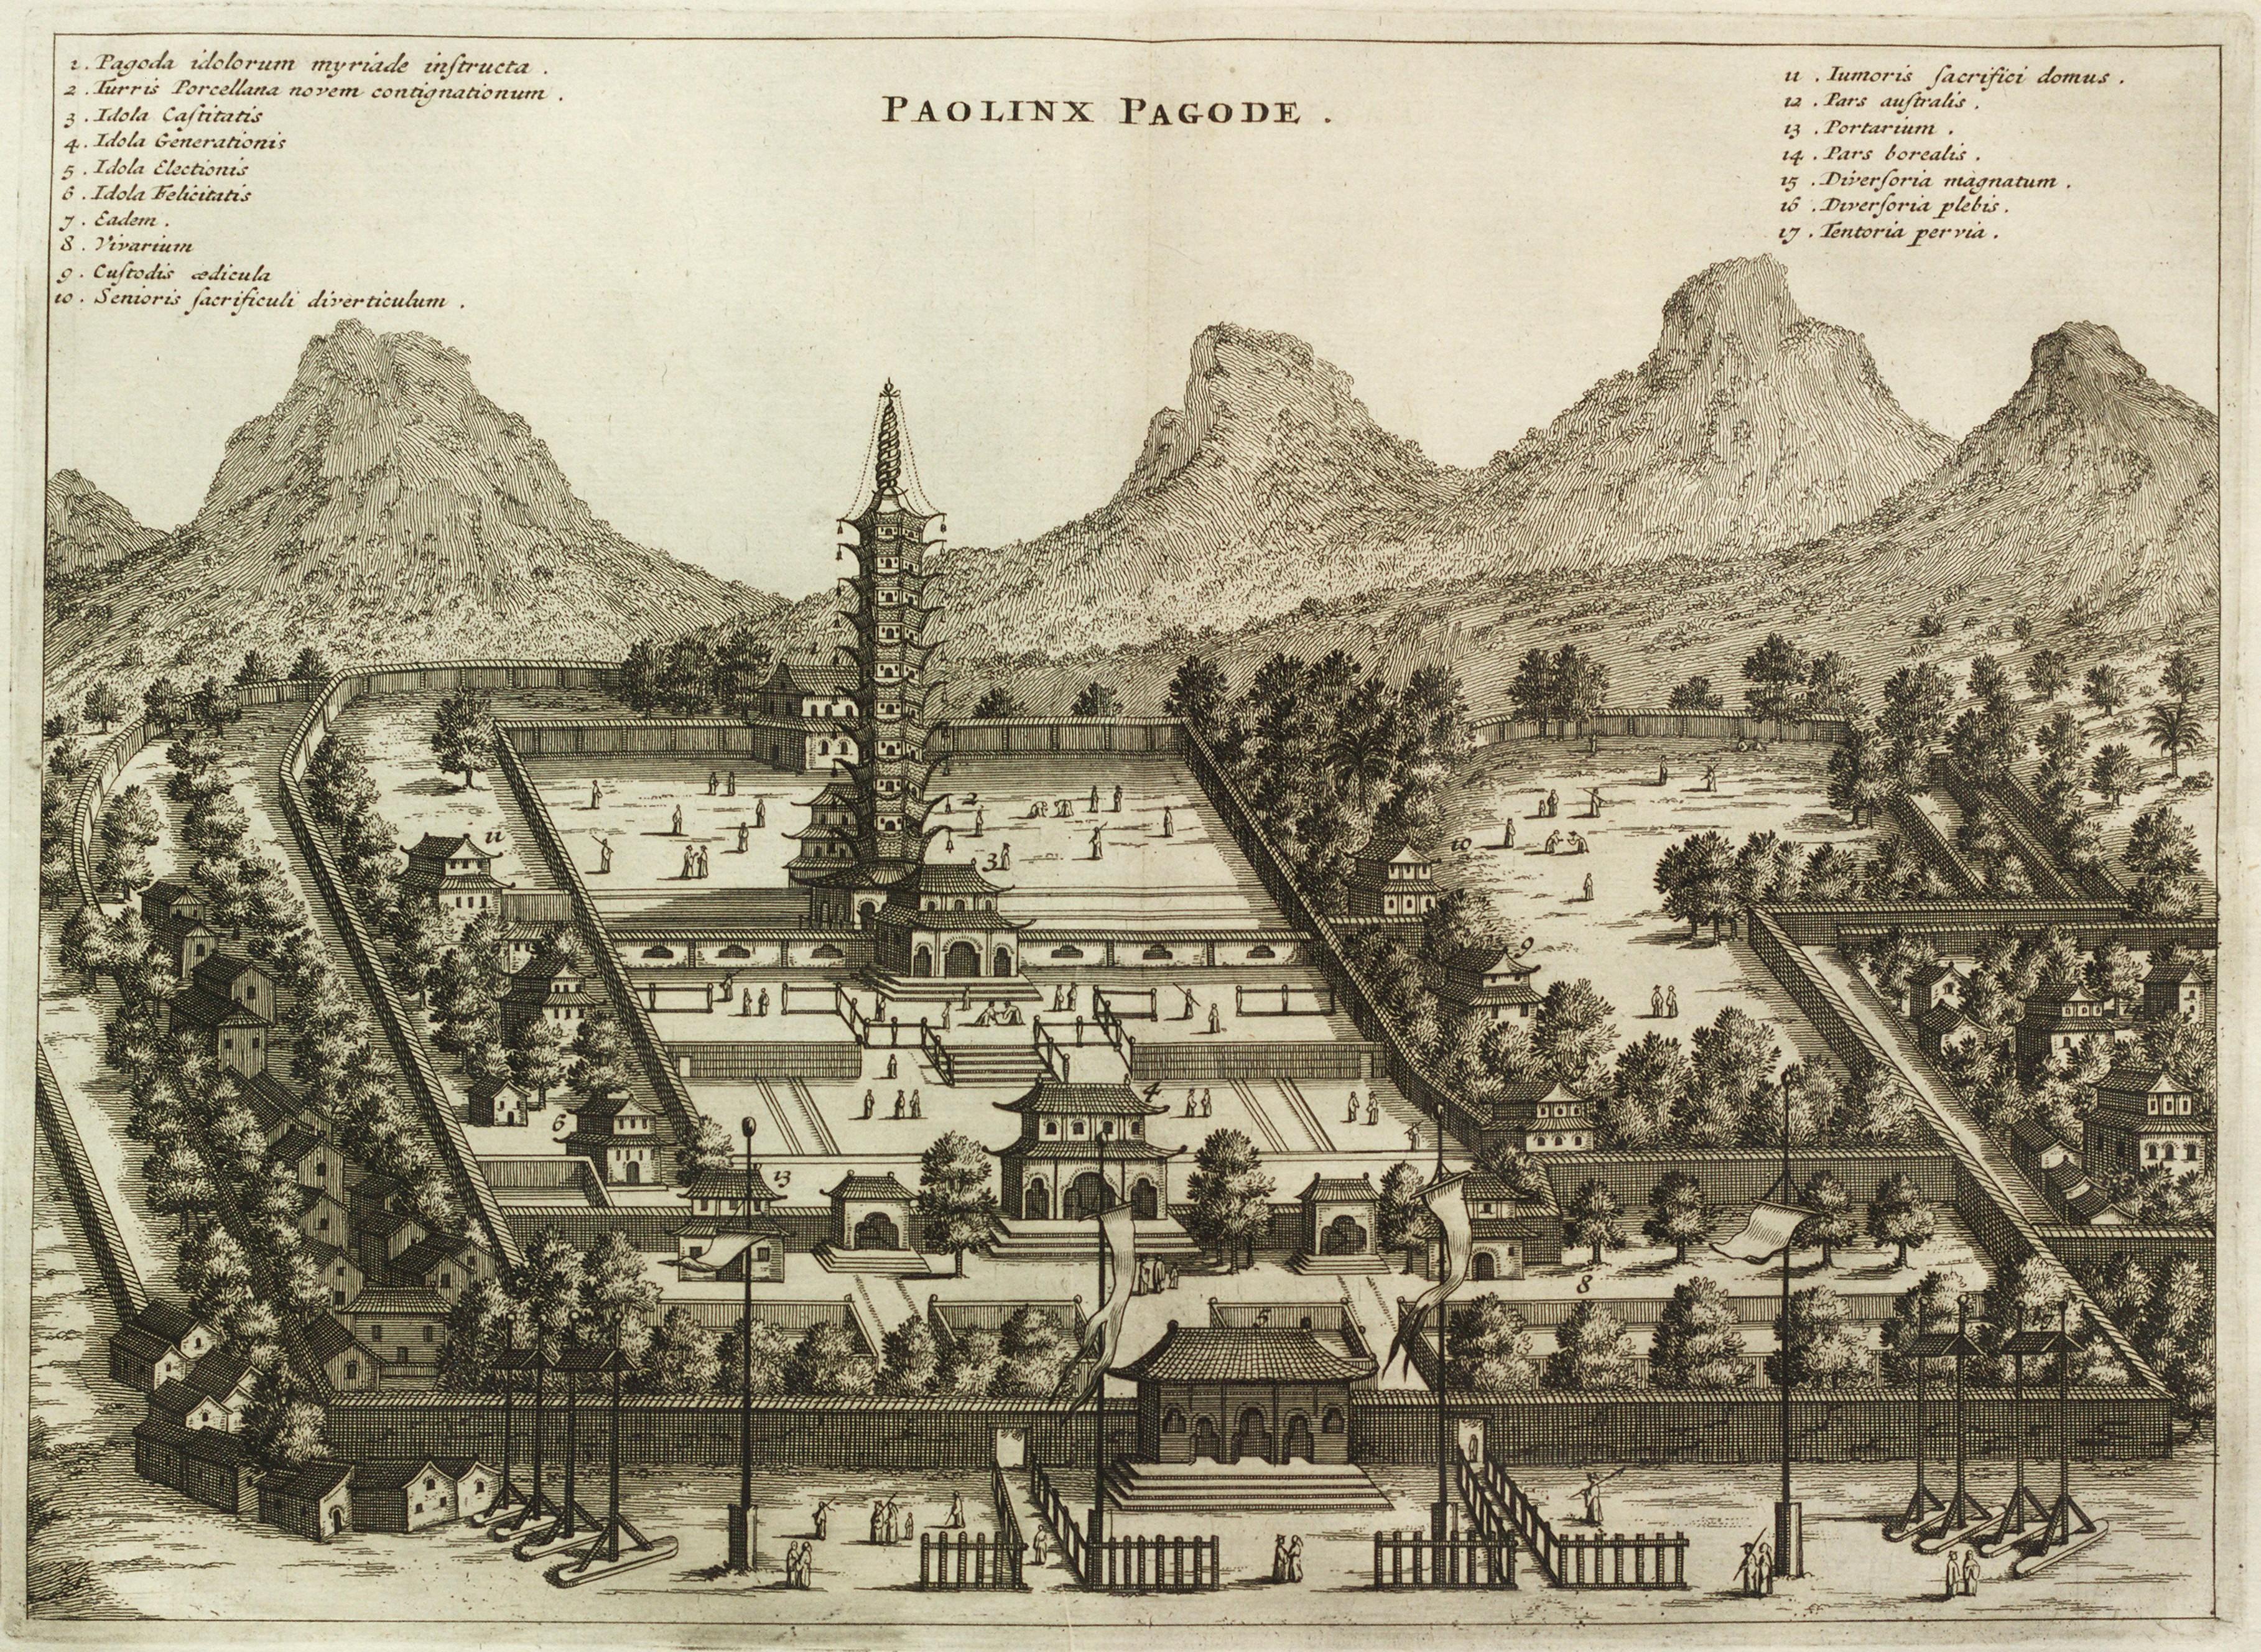 File:UB Maastricht - Dapper 1670 - Paolinx.jpg